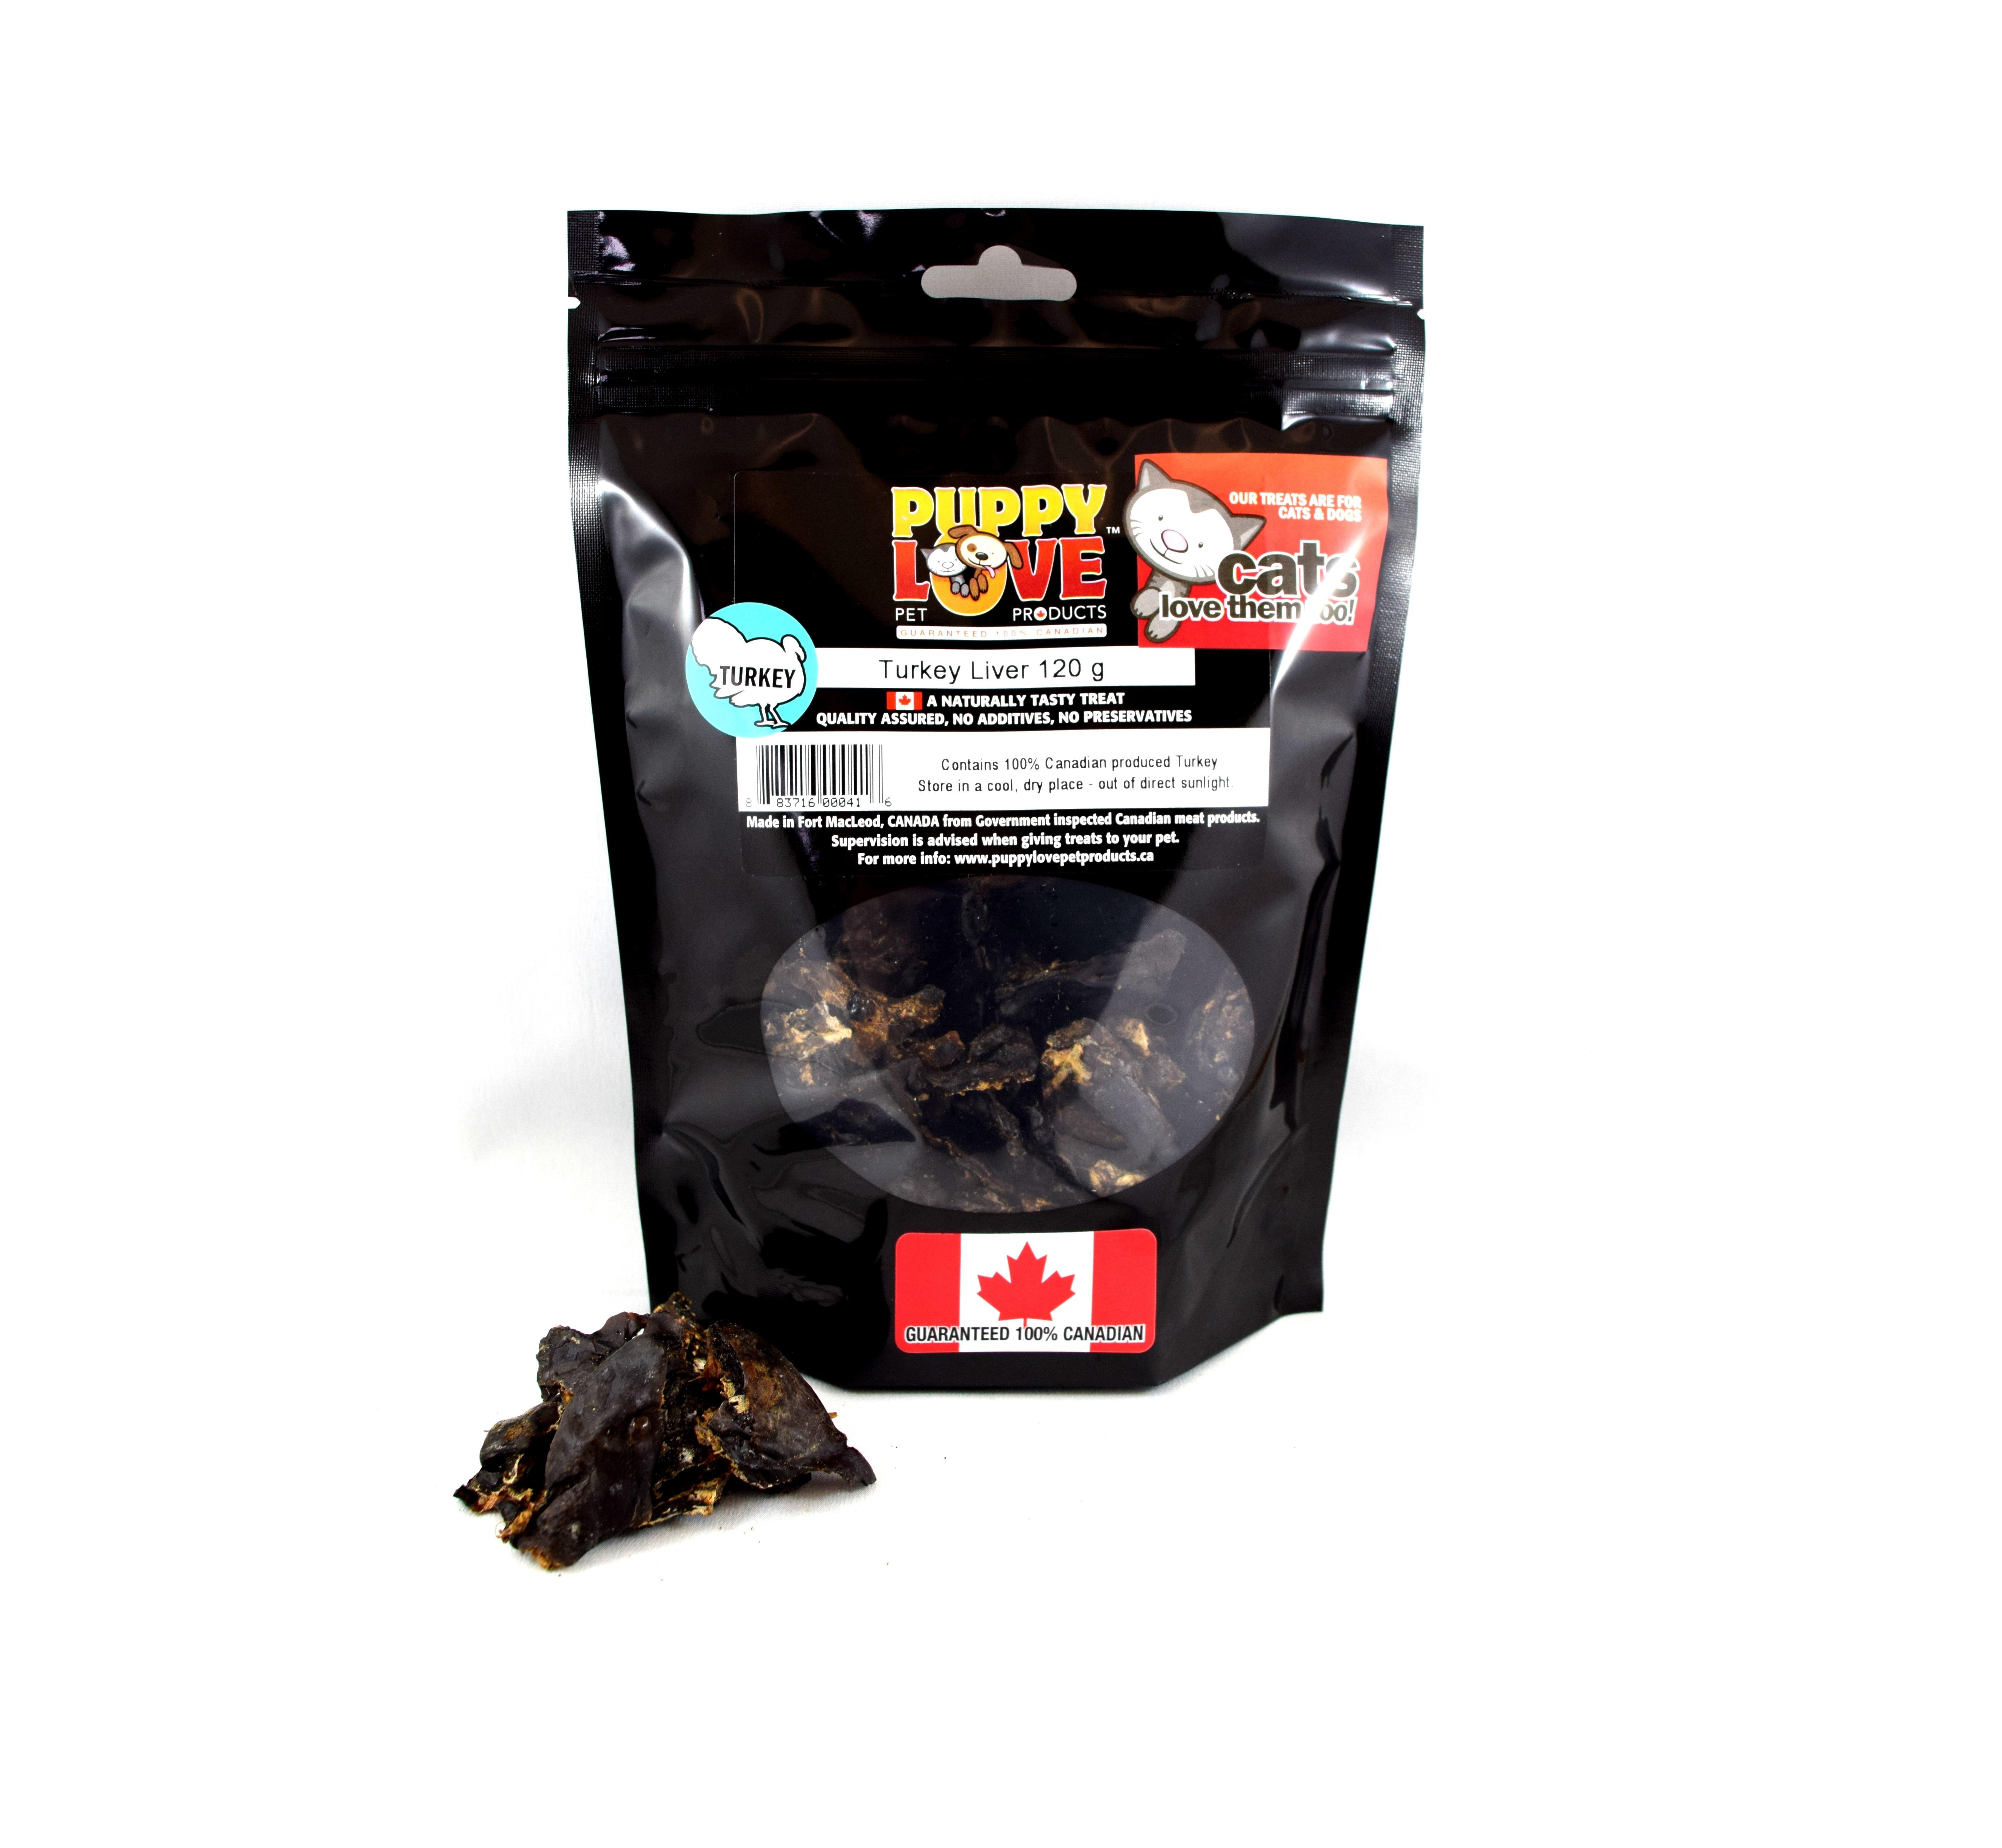 Puppy Love Turkey Liver Freeze-Dried Dog Treats, 120-gram